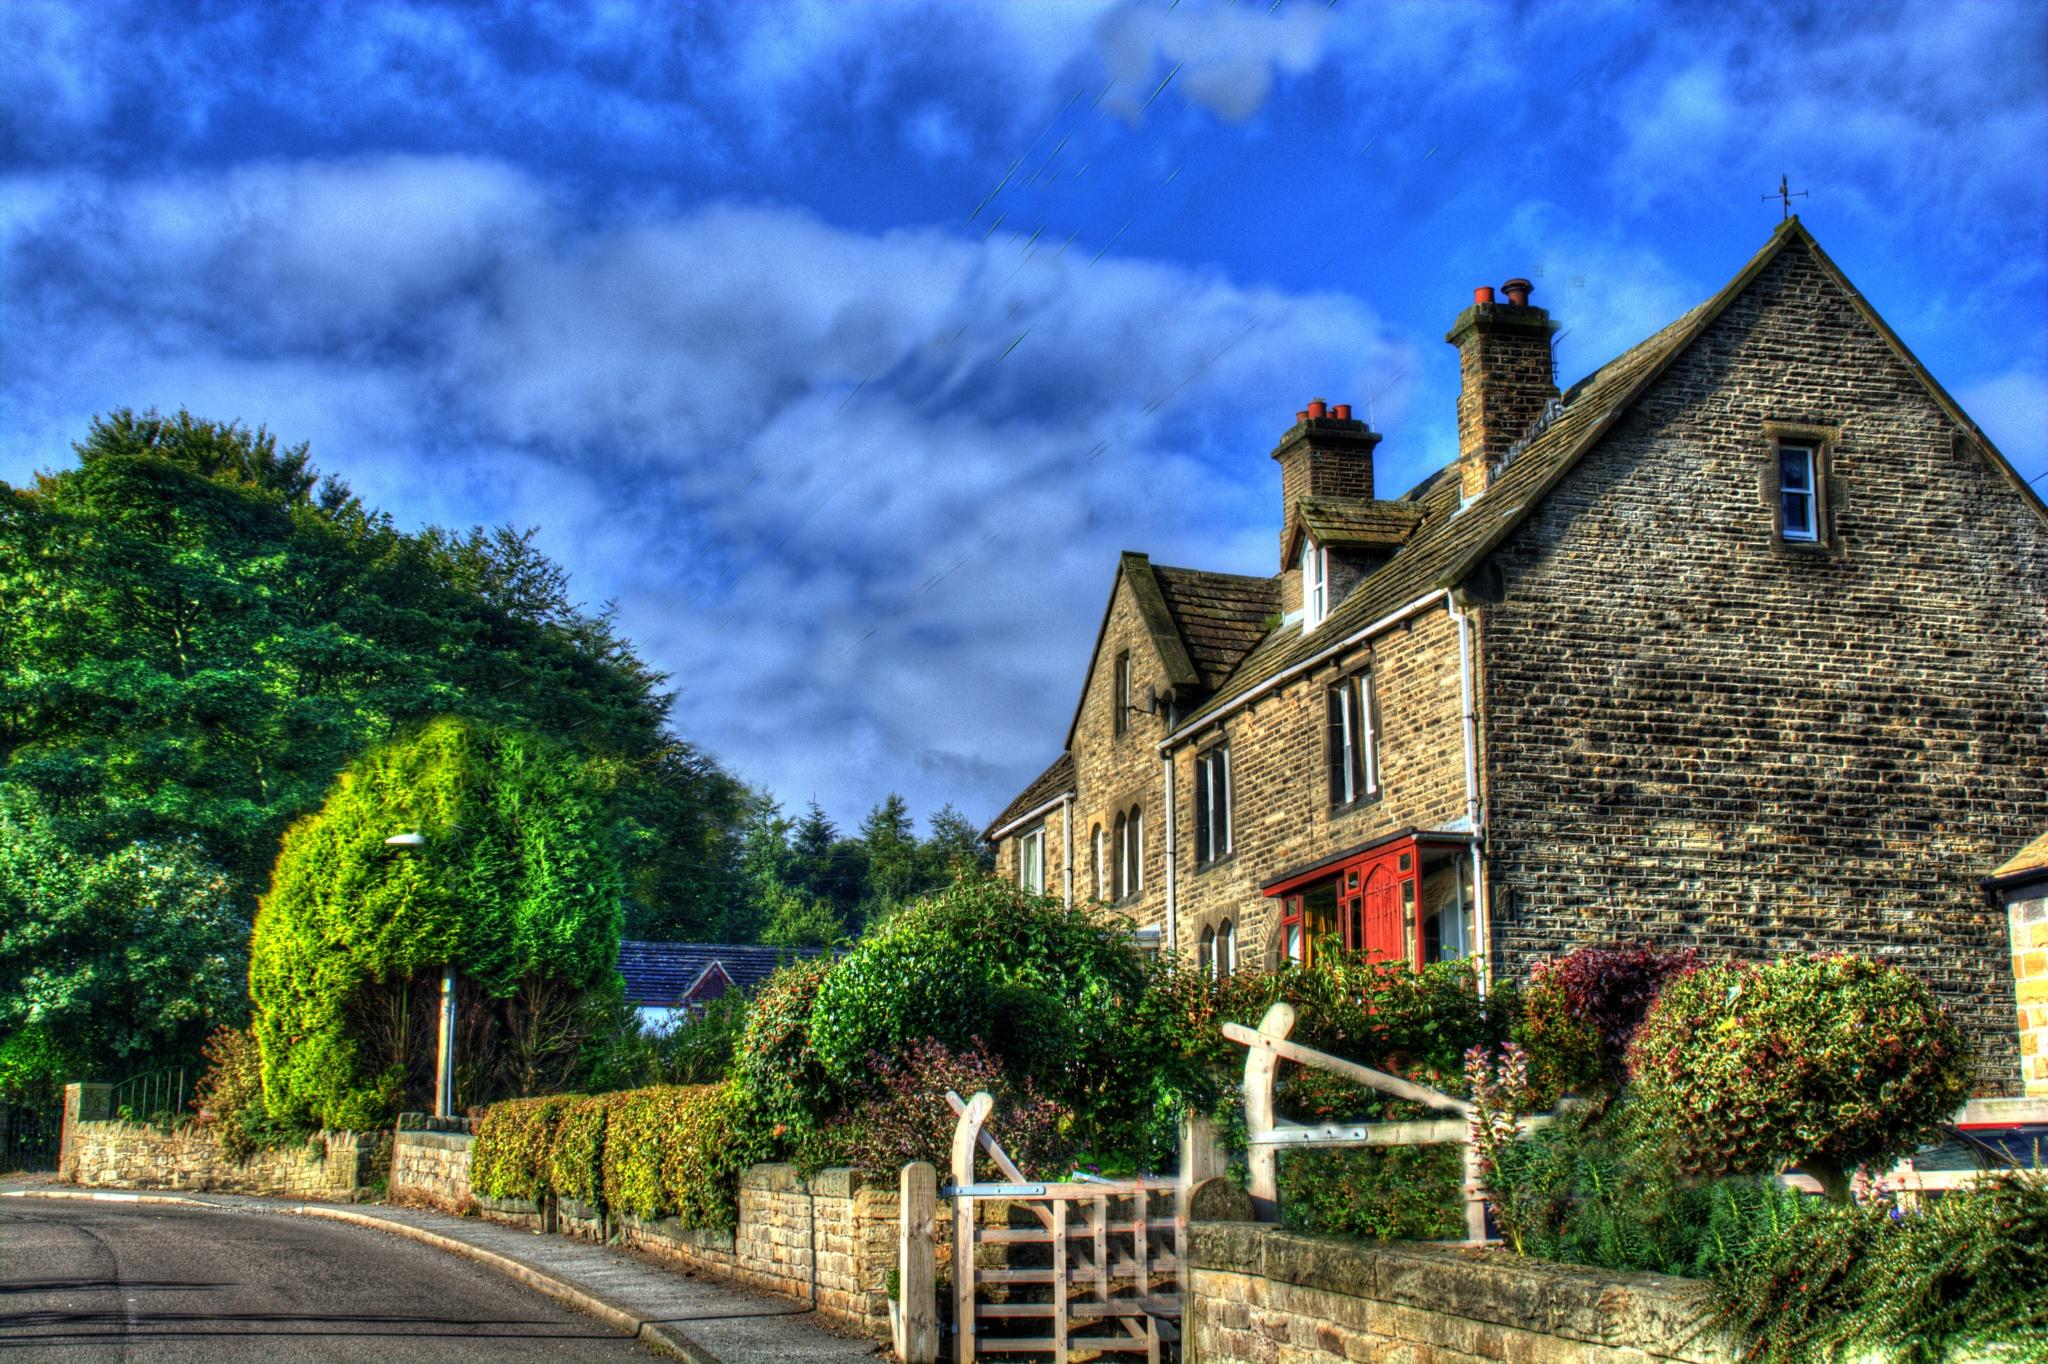 village scene near holmfirth yorkshire by Stuart Robertshaw Photography